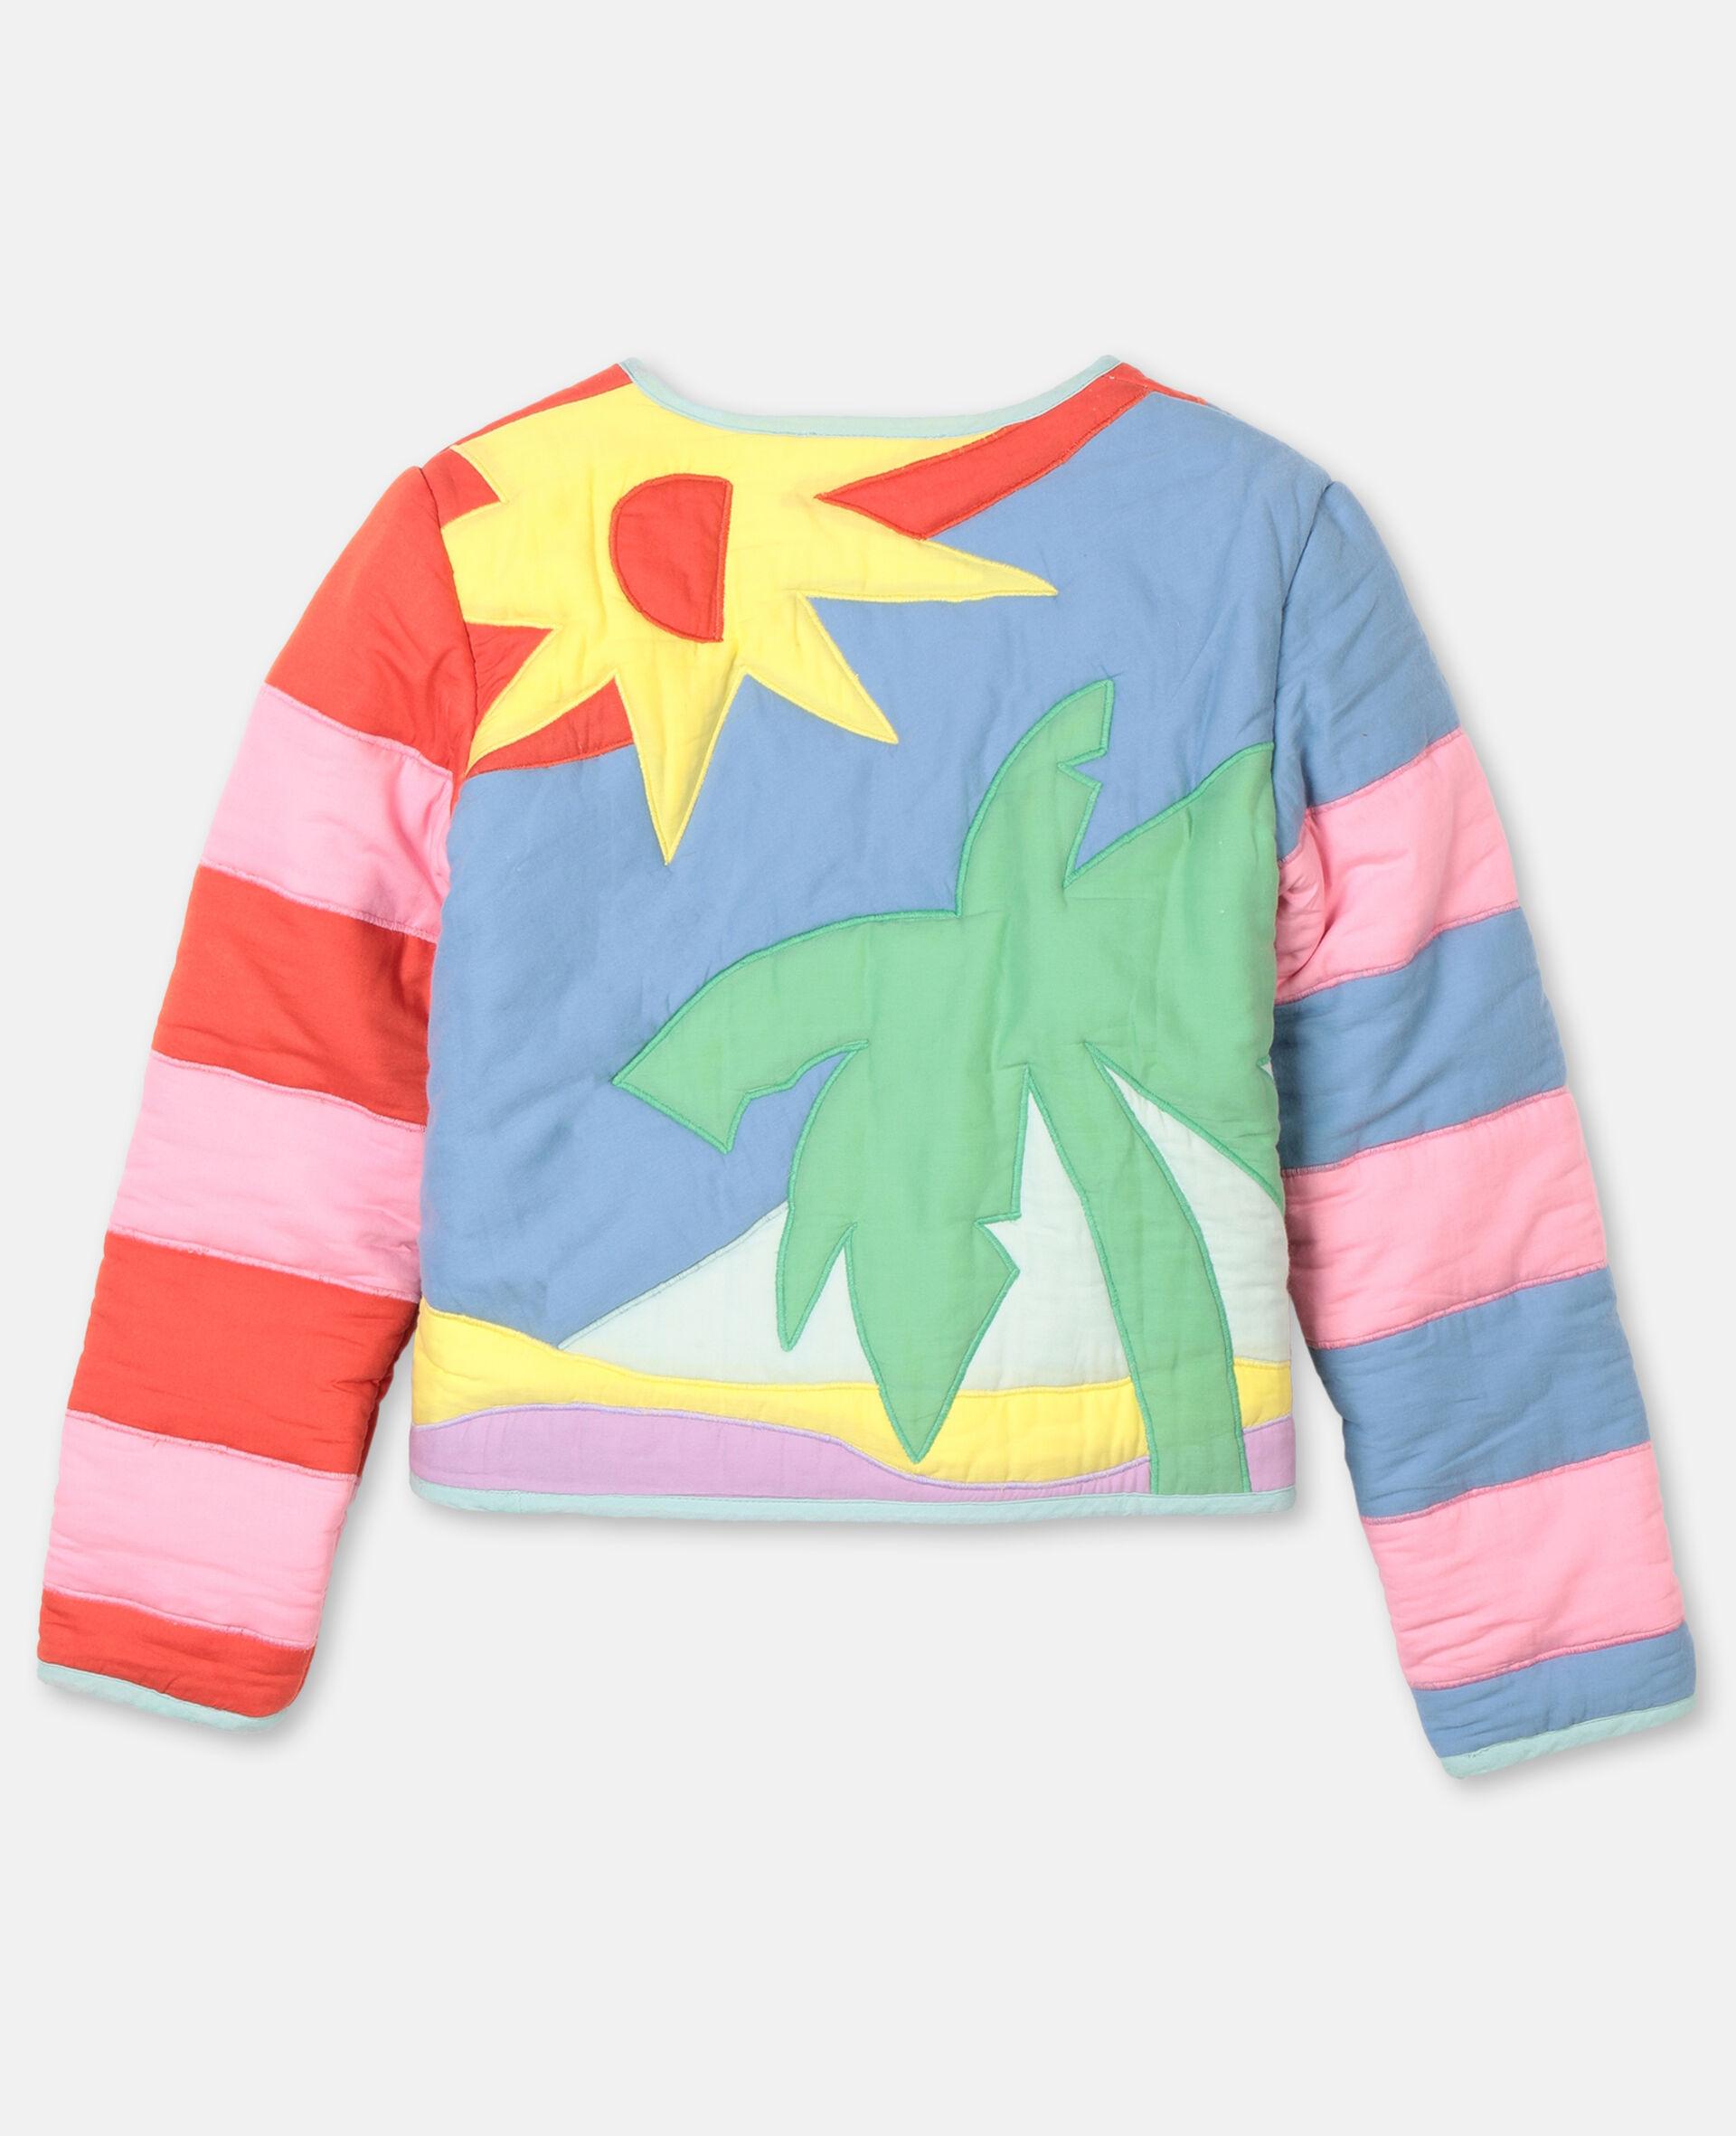 Palms Patches Cotton Jacket -Multicolour-large image number 3